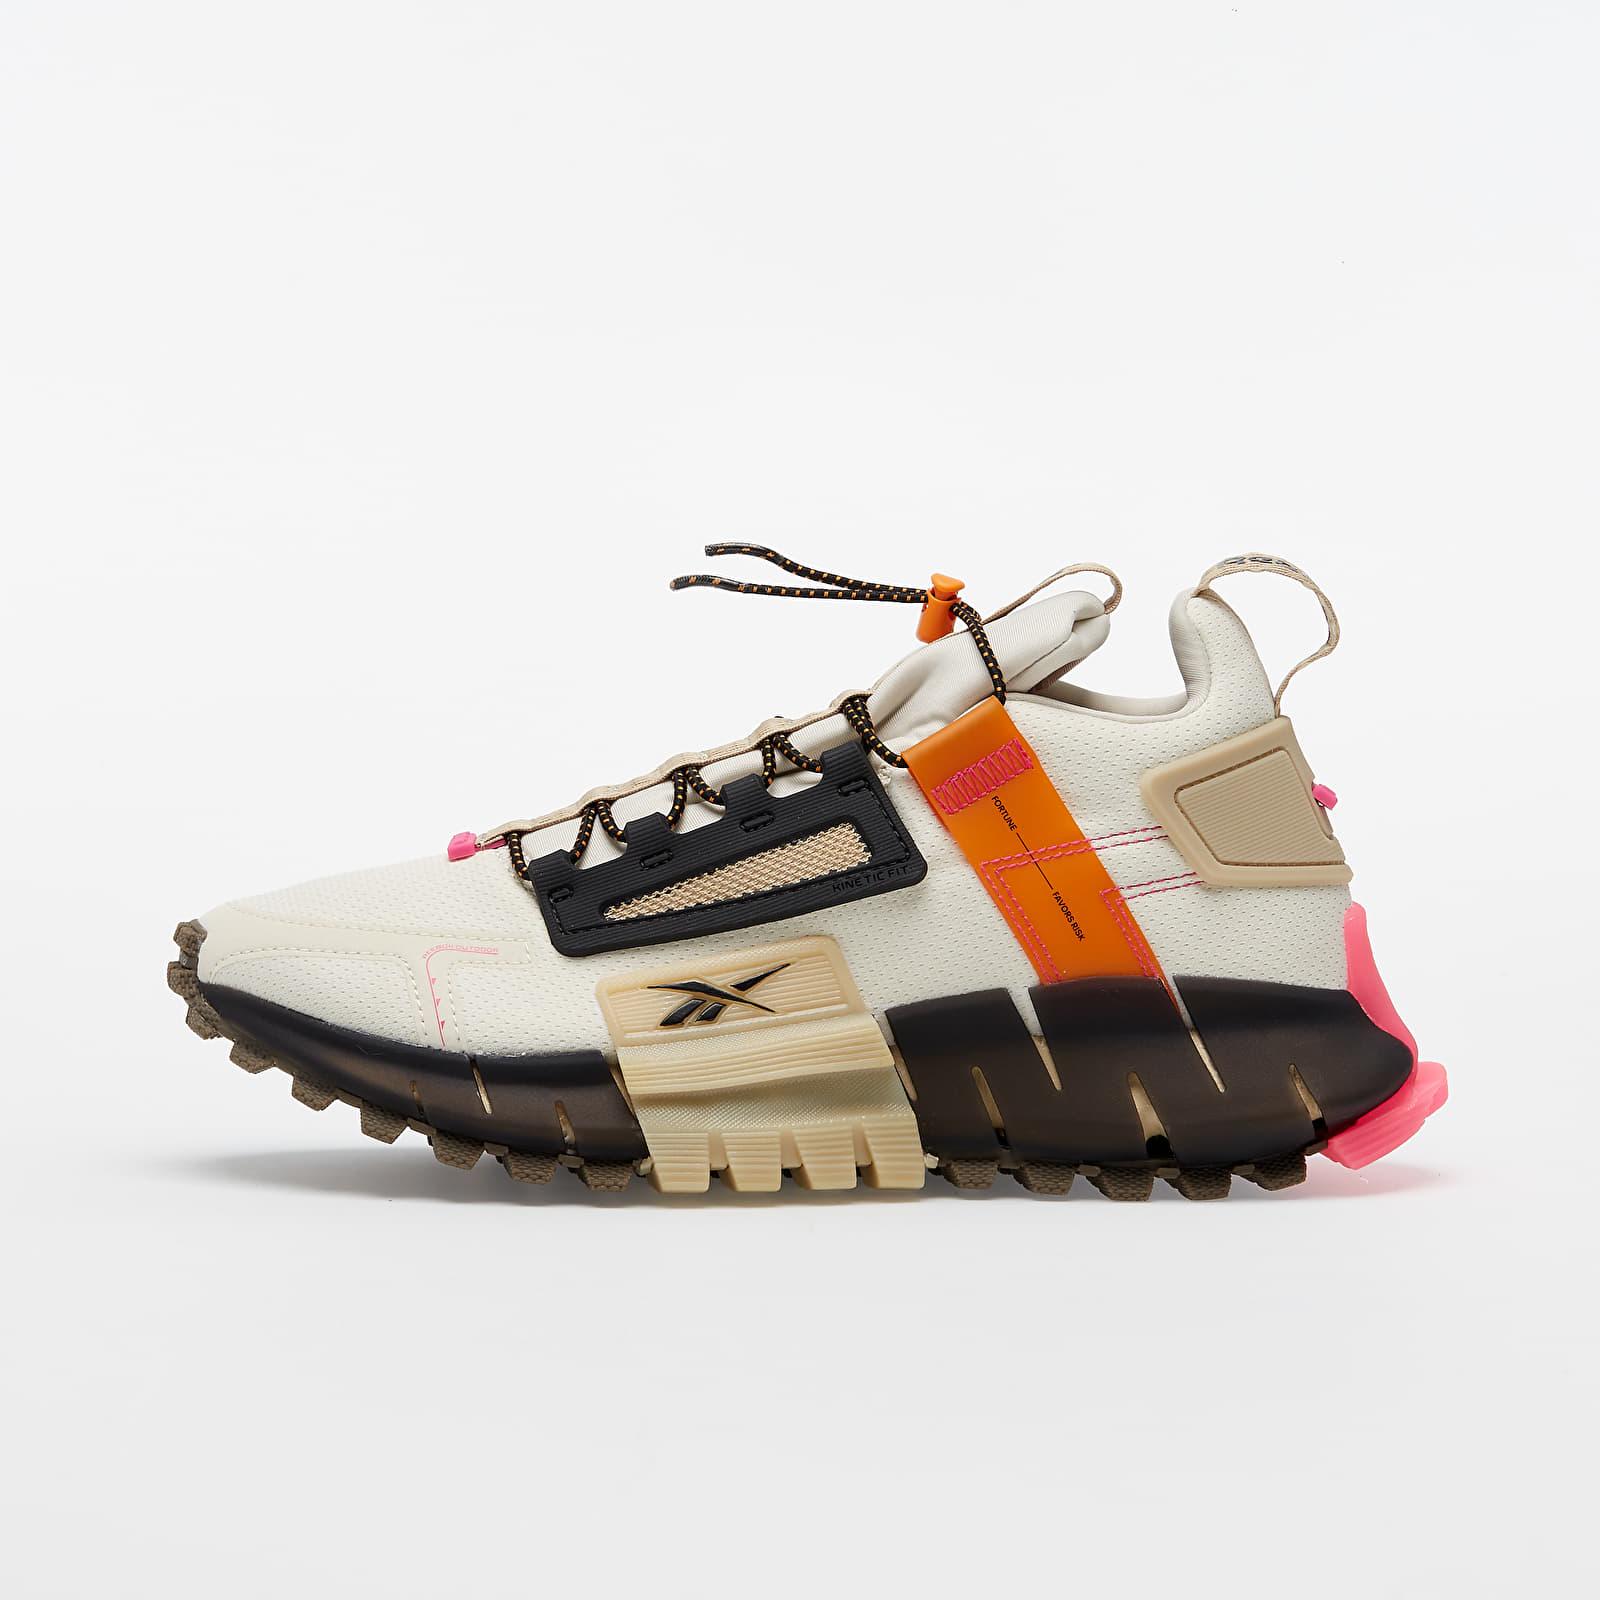 Men's shoes Reebok Zig Kinetica Edge Alabaster/ High Vivid Orange/ Pro Pink